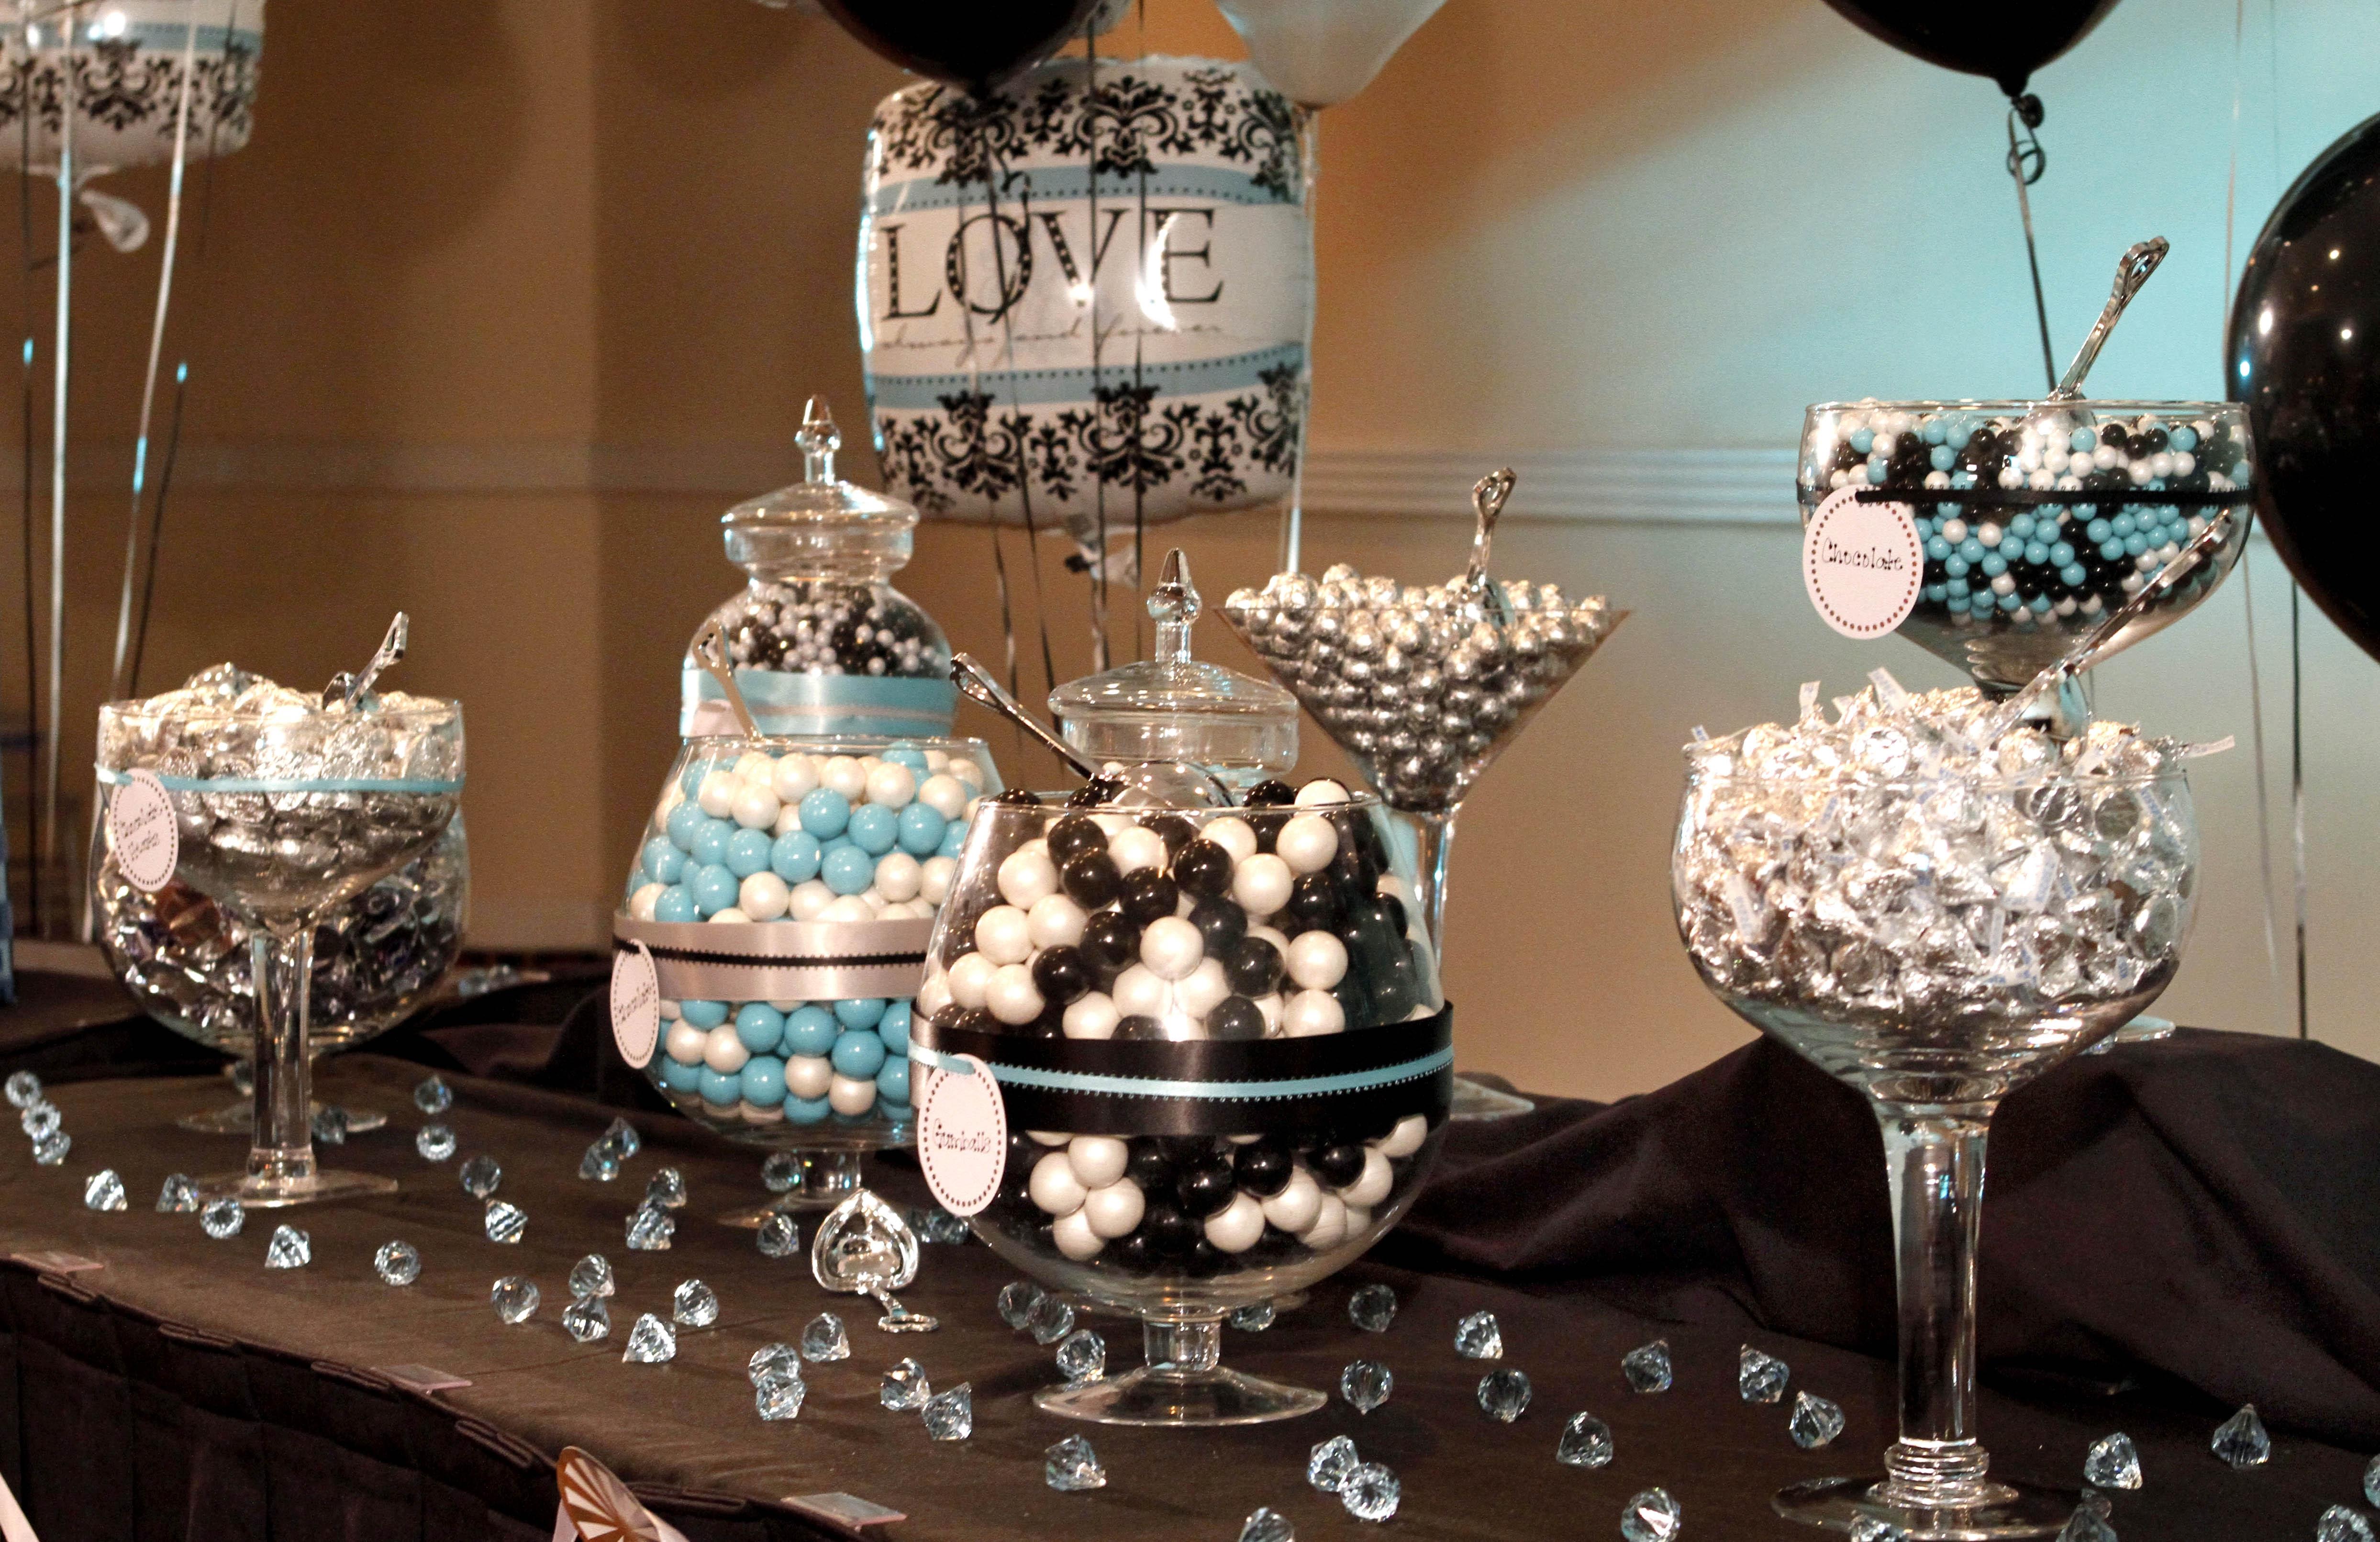 June 39 s anniversary on pinterest turquoise wedding decor for Black and white wedding decor